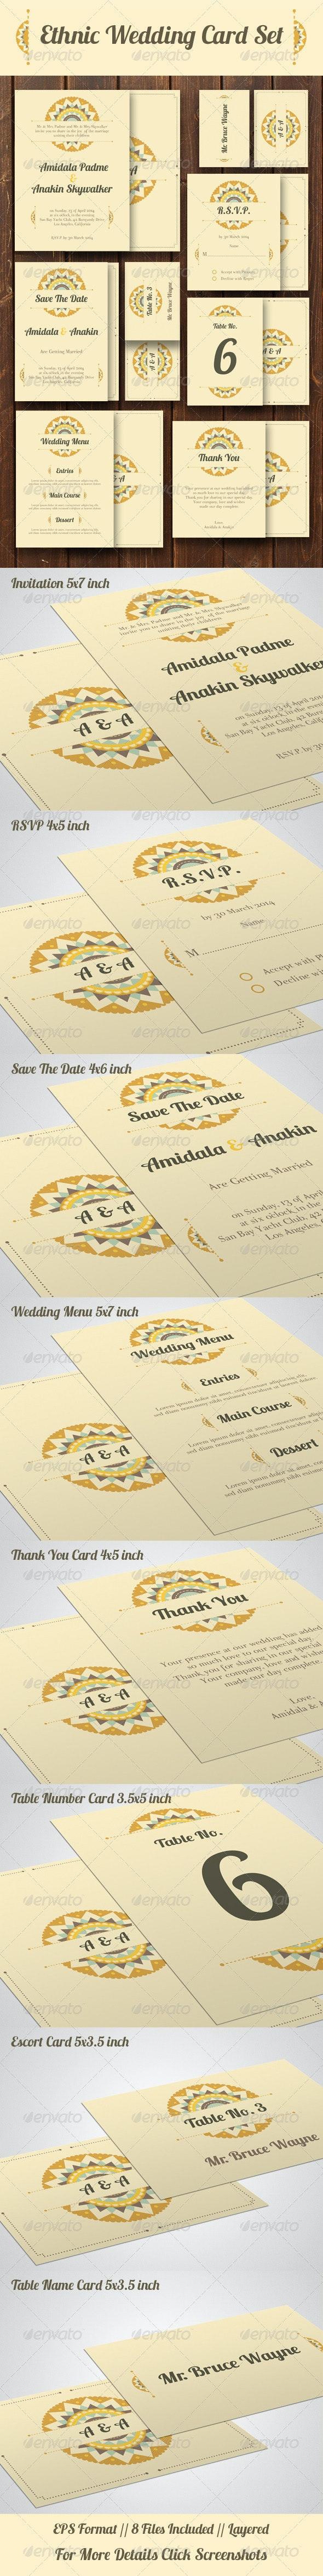 Ethnic Wedding Card Set - Weddings Cards & Invites